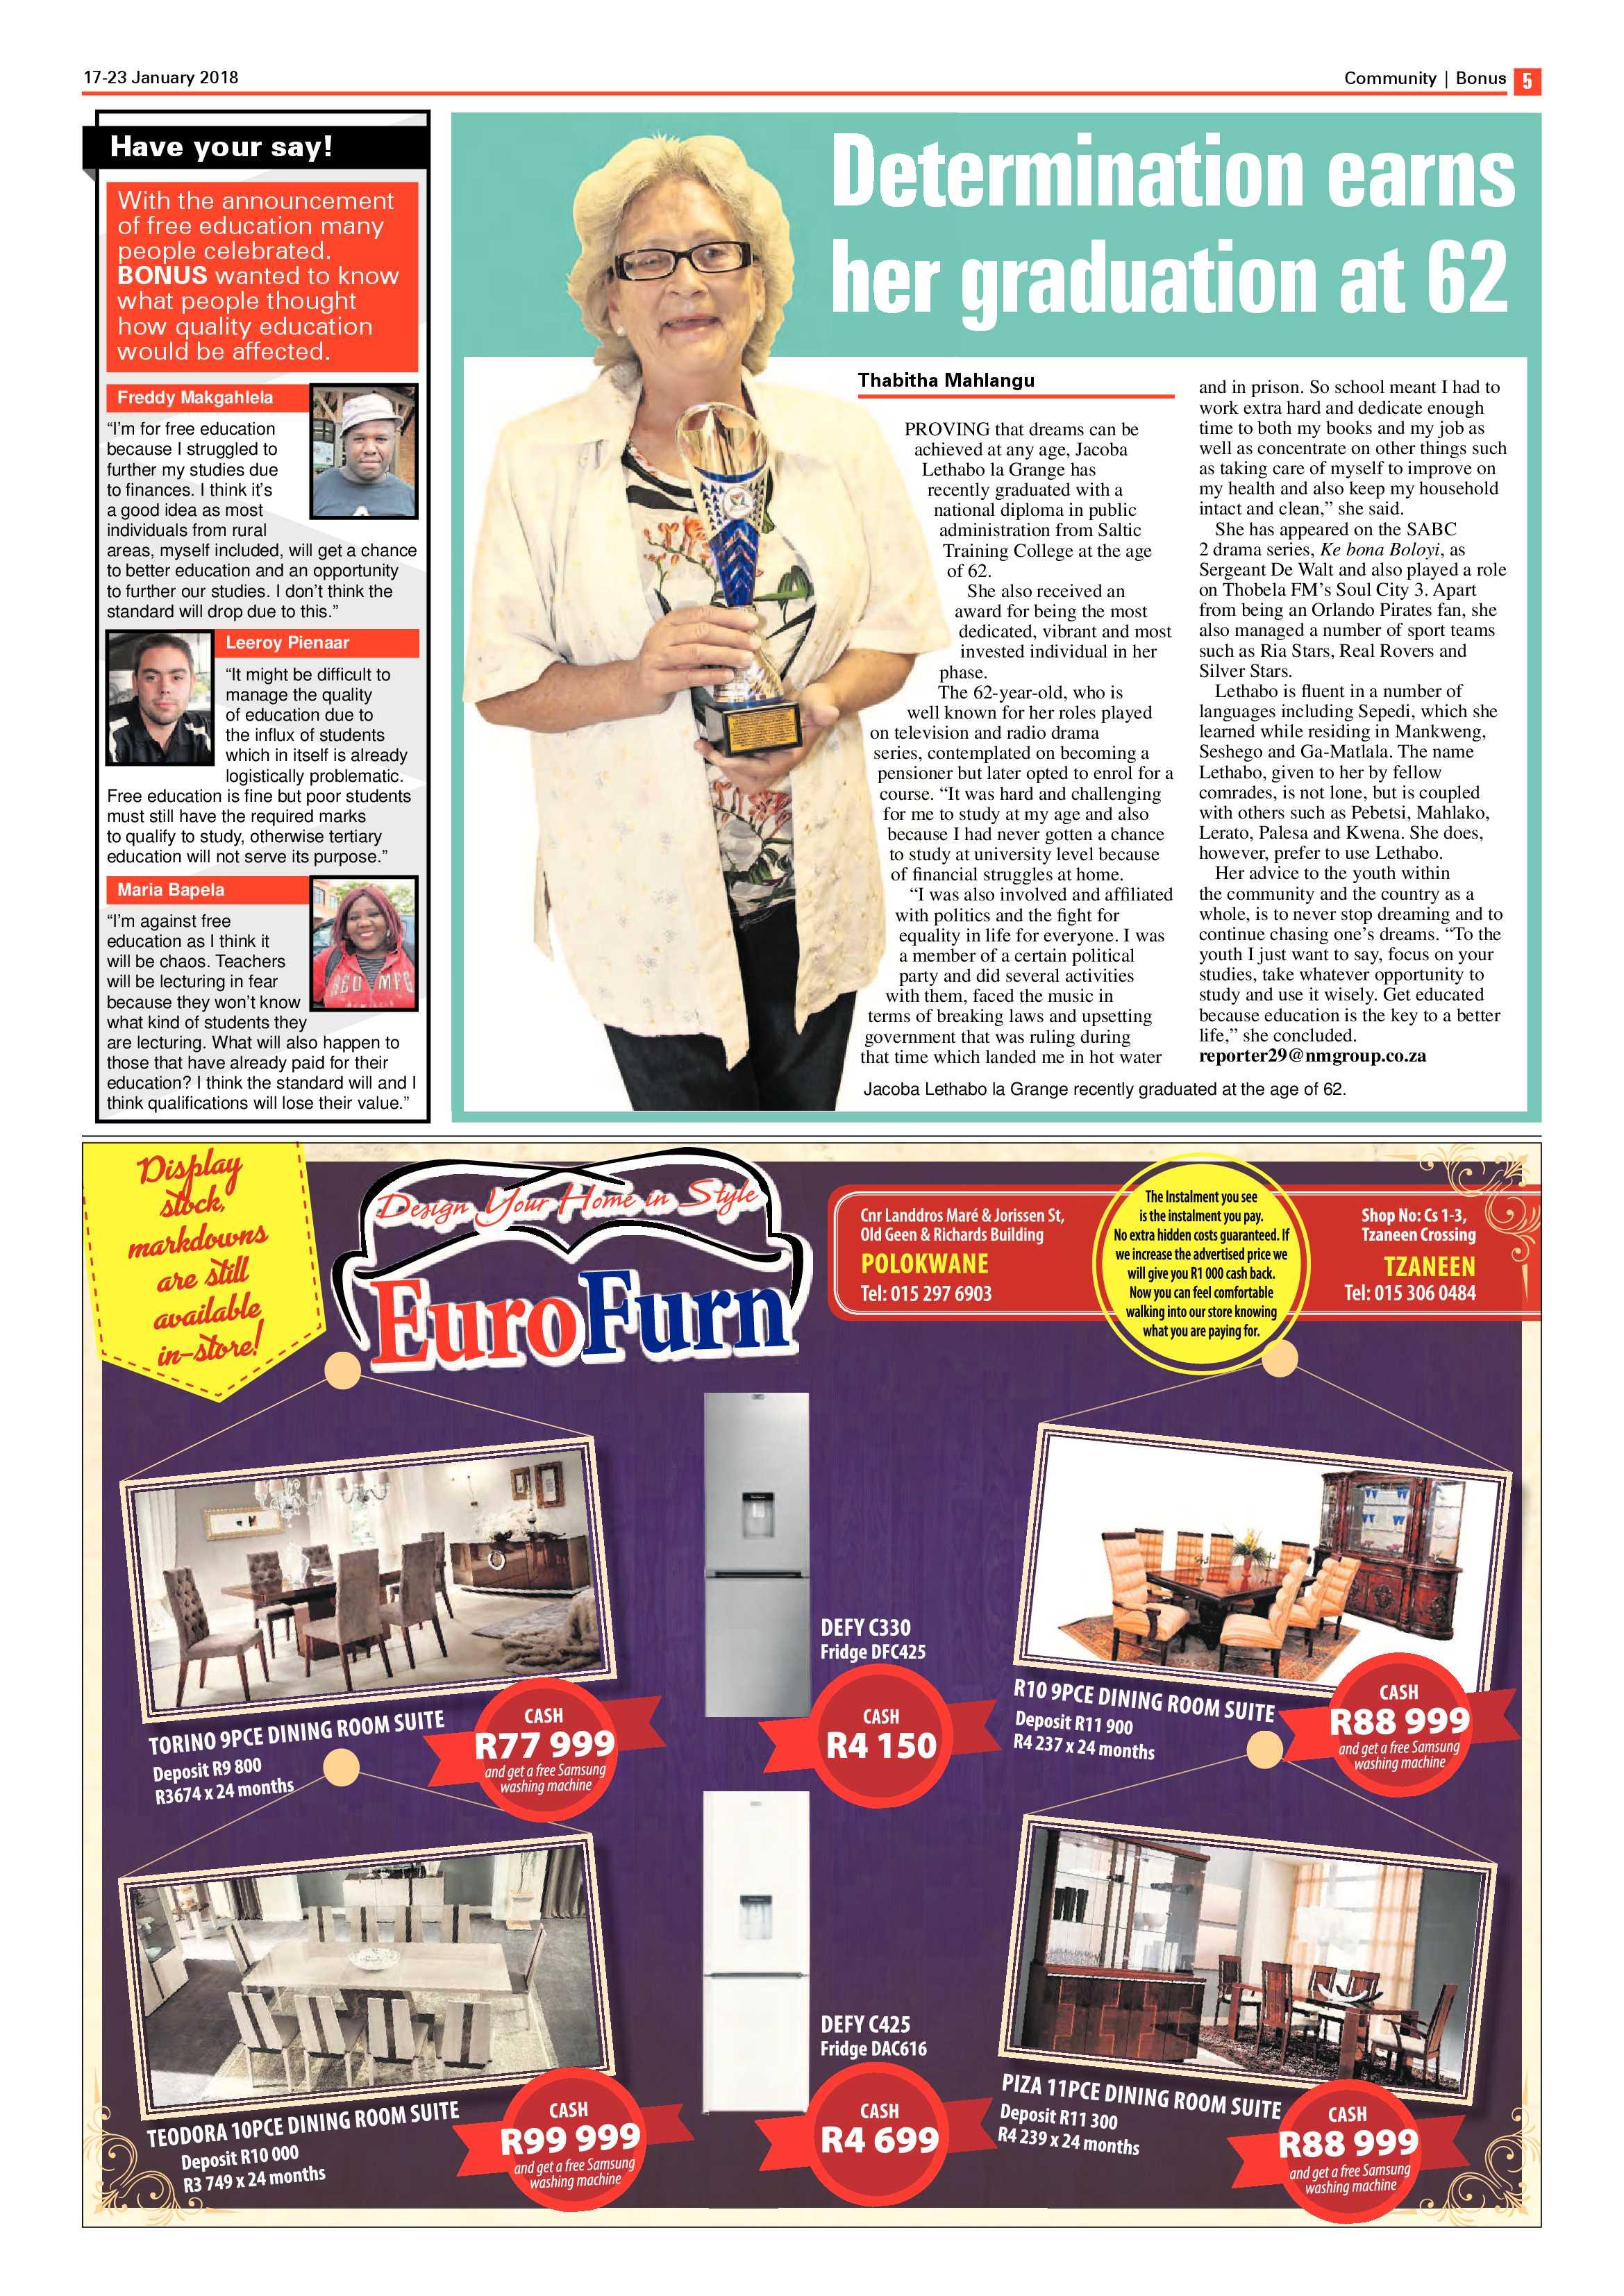 review-bonus-17-january-2018-epapers-page-5